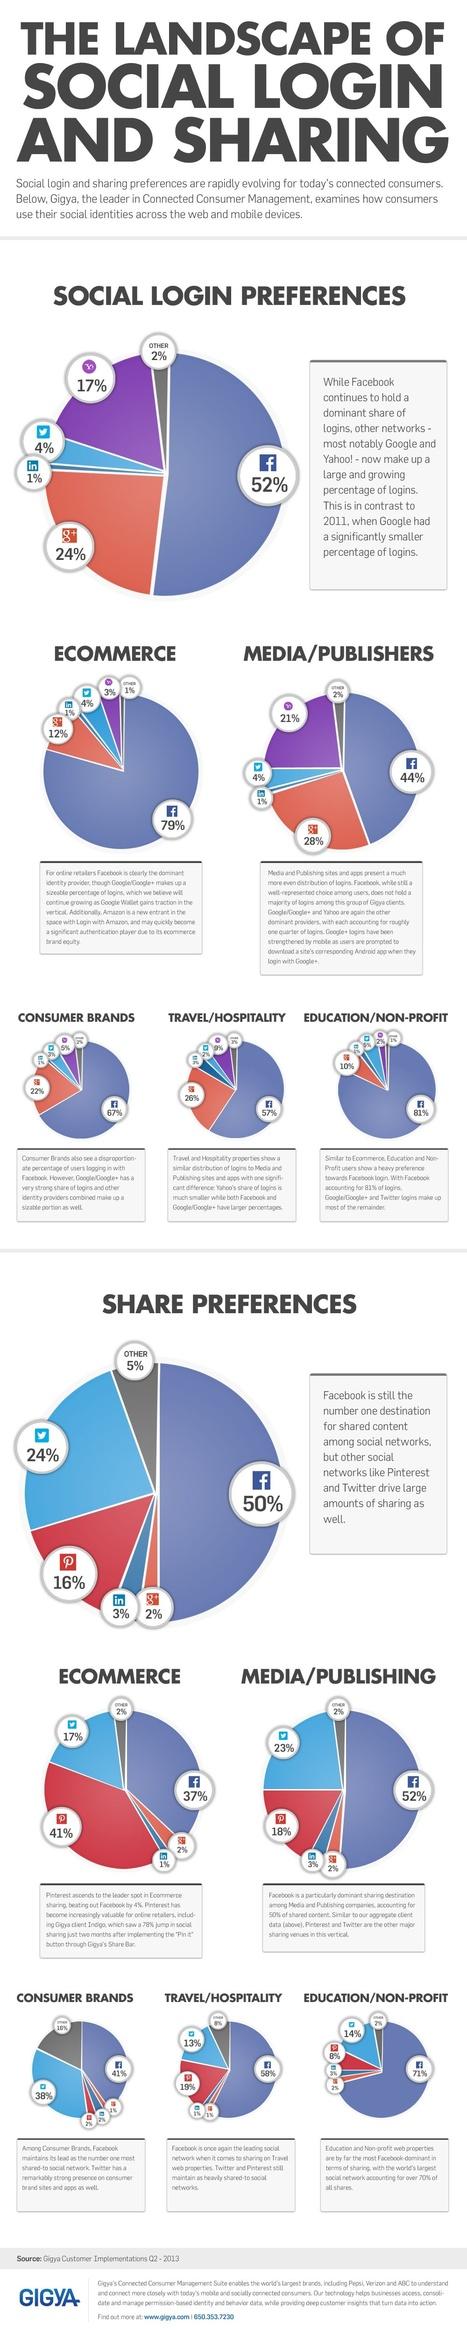 The Landscape of Social Login & Sharing Infographic | Plus Examiner | Social Media Marketing | Scoop.it